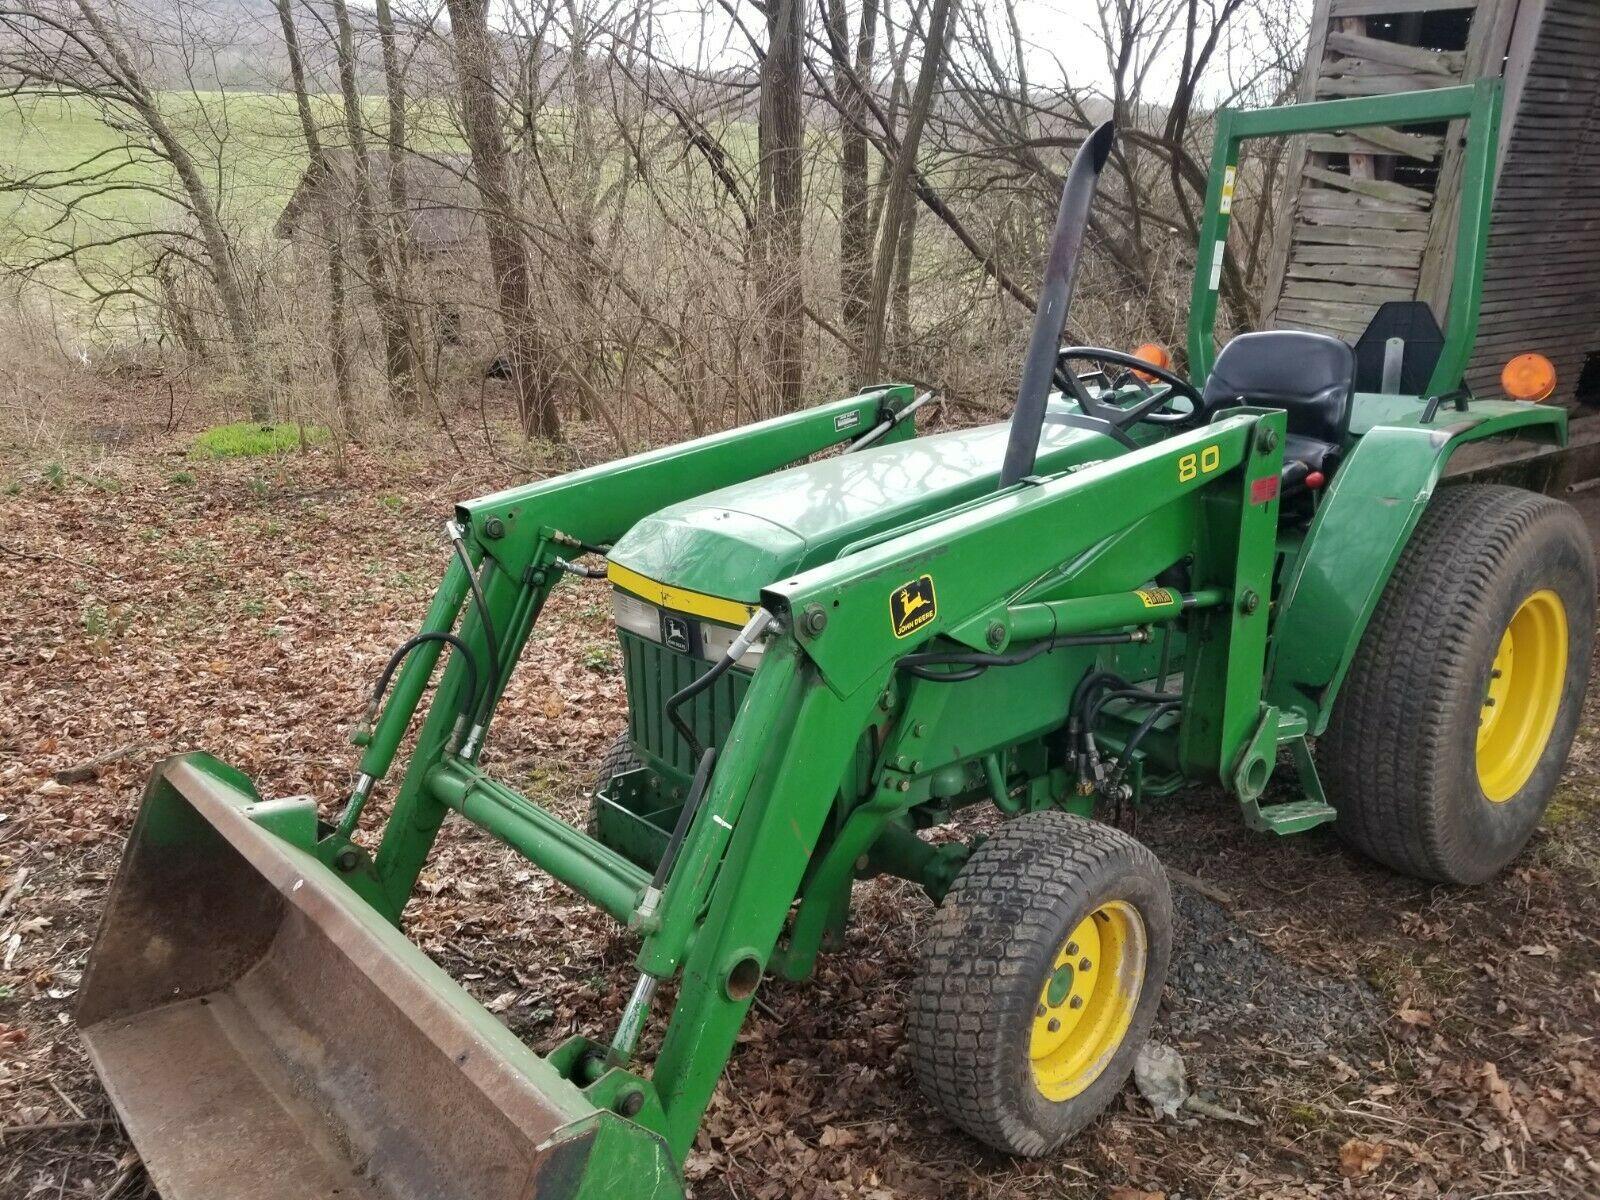 Diesel Farm Tractors Tractors Farm Tractor Diesel